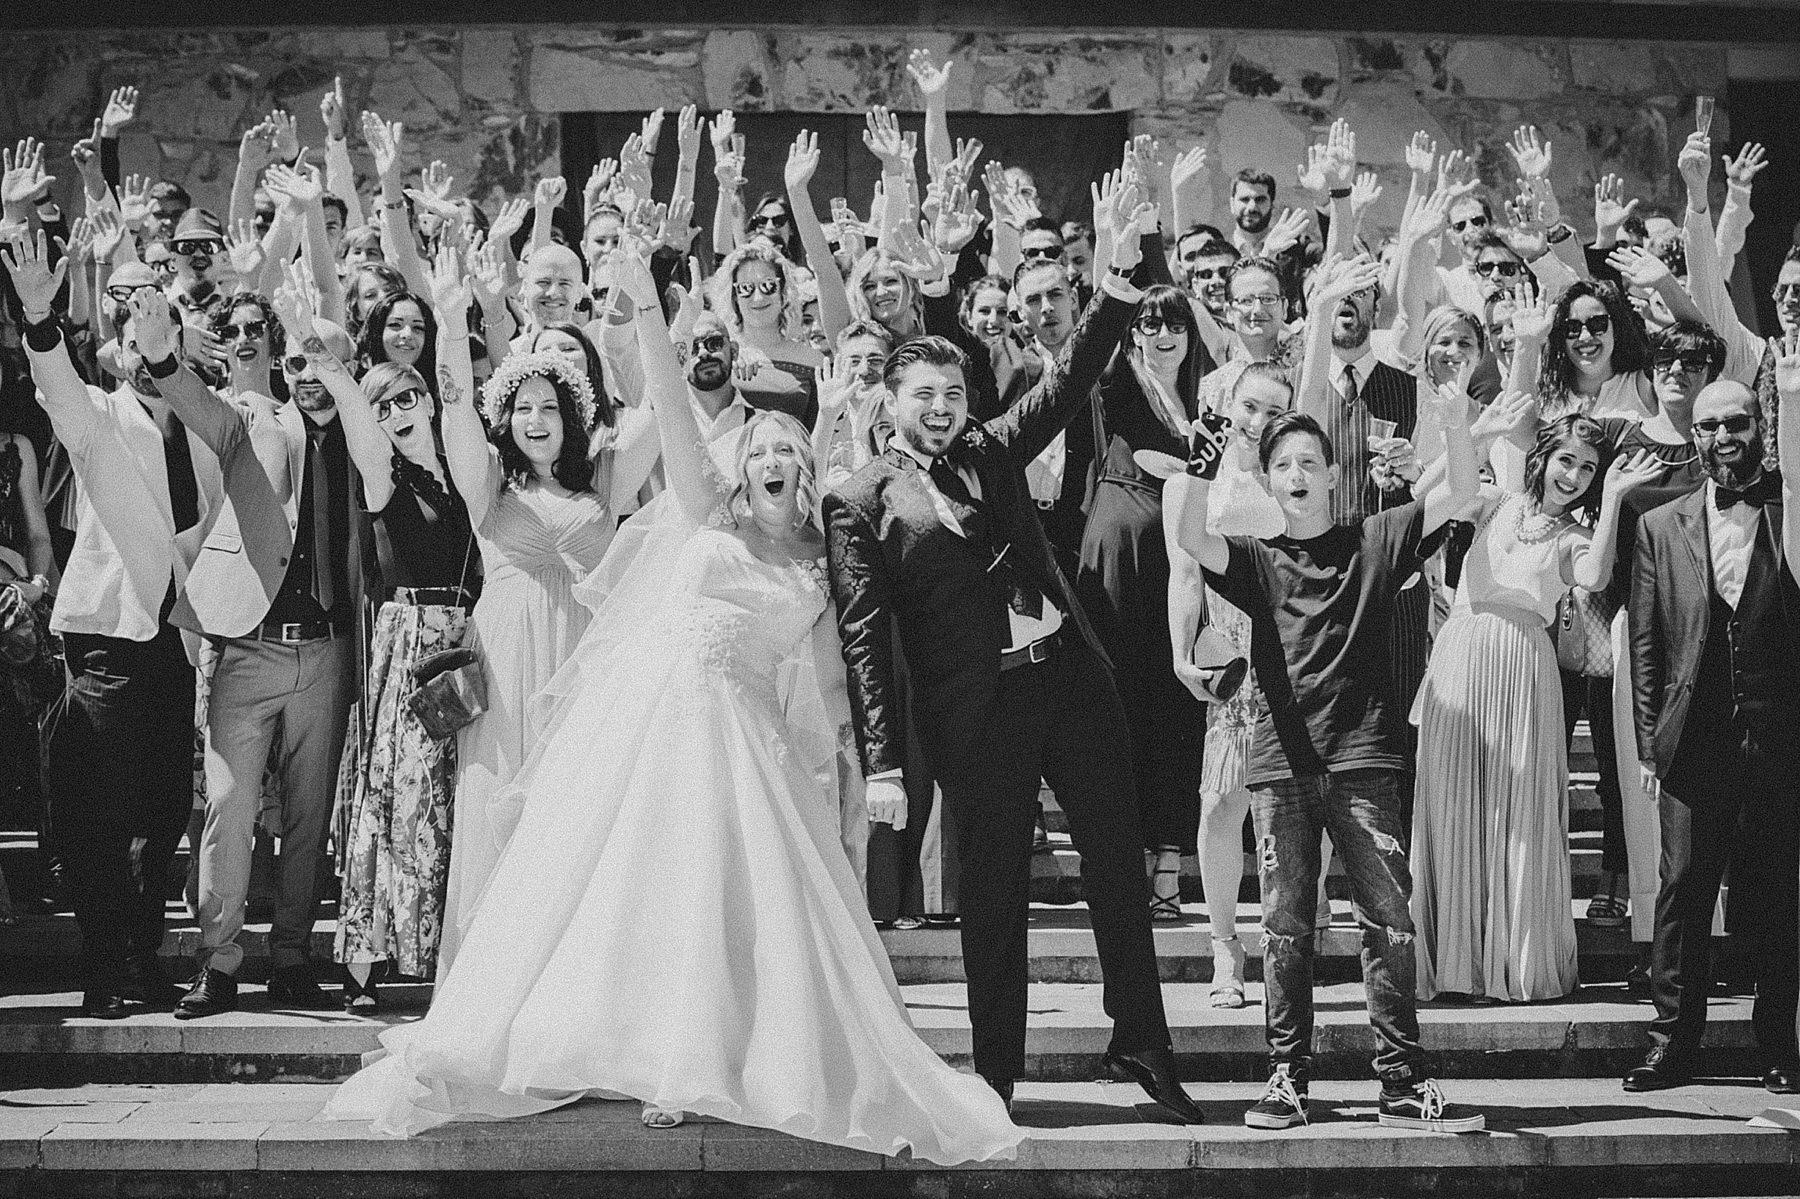 foto gruppone invitati matrimonio